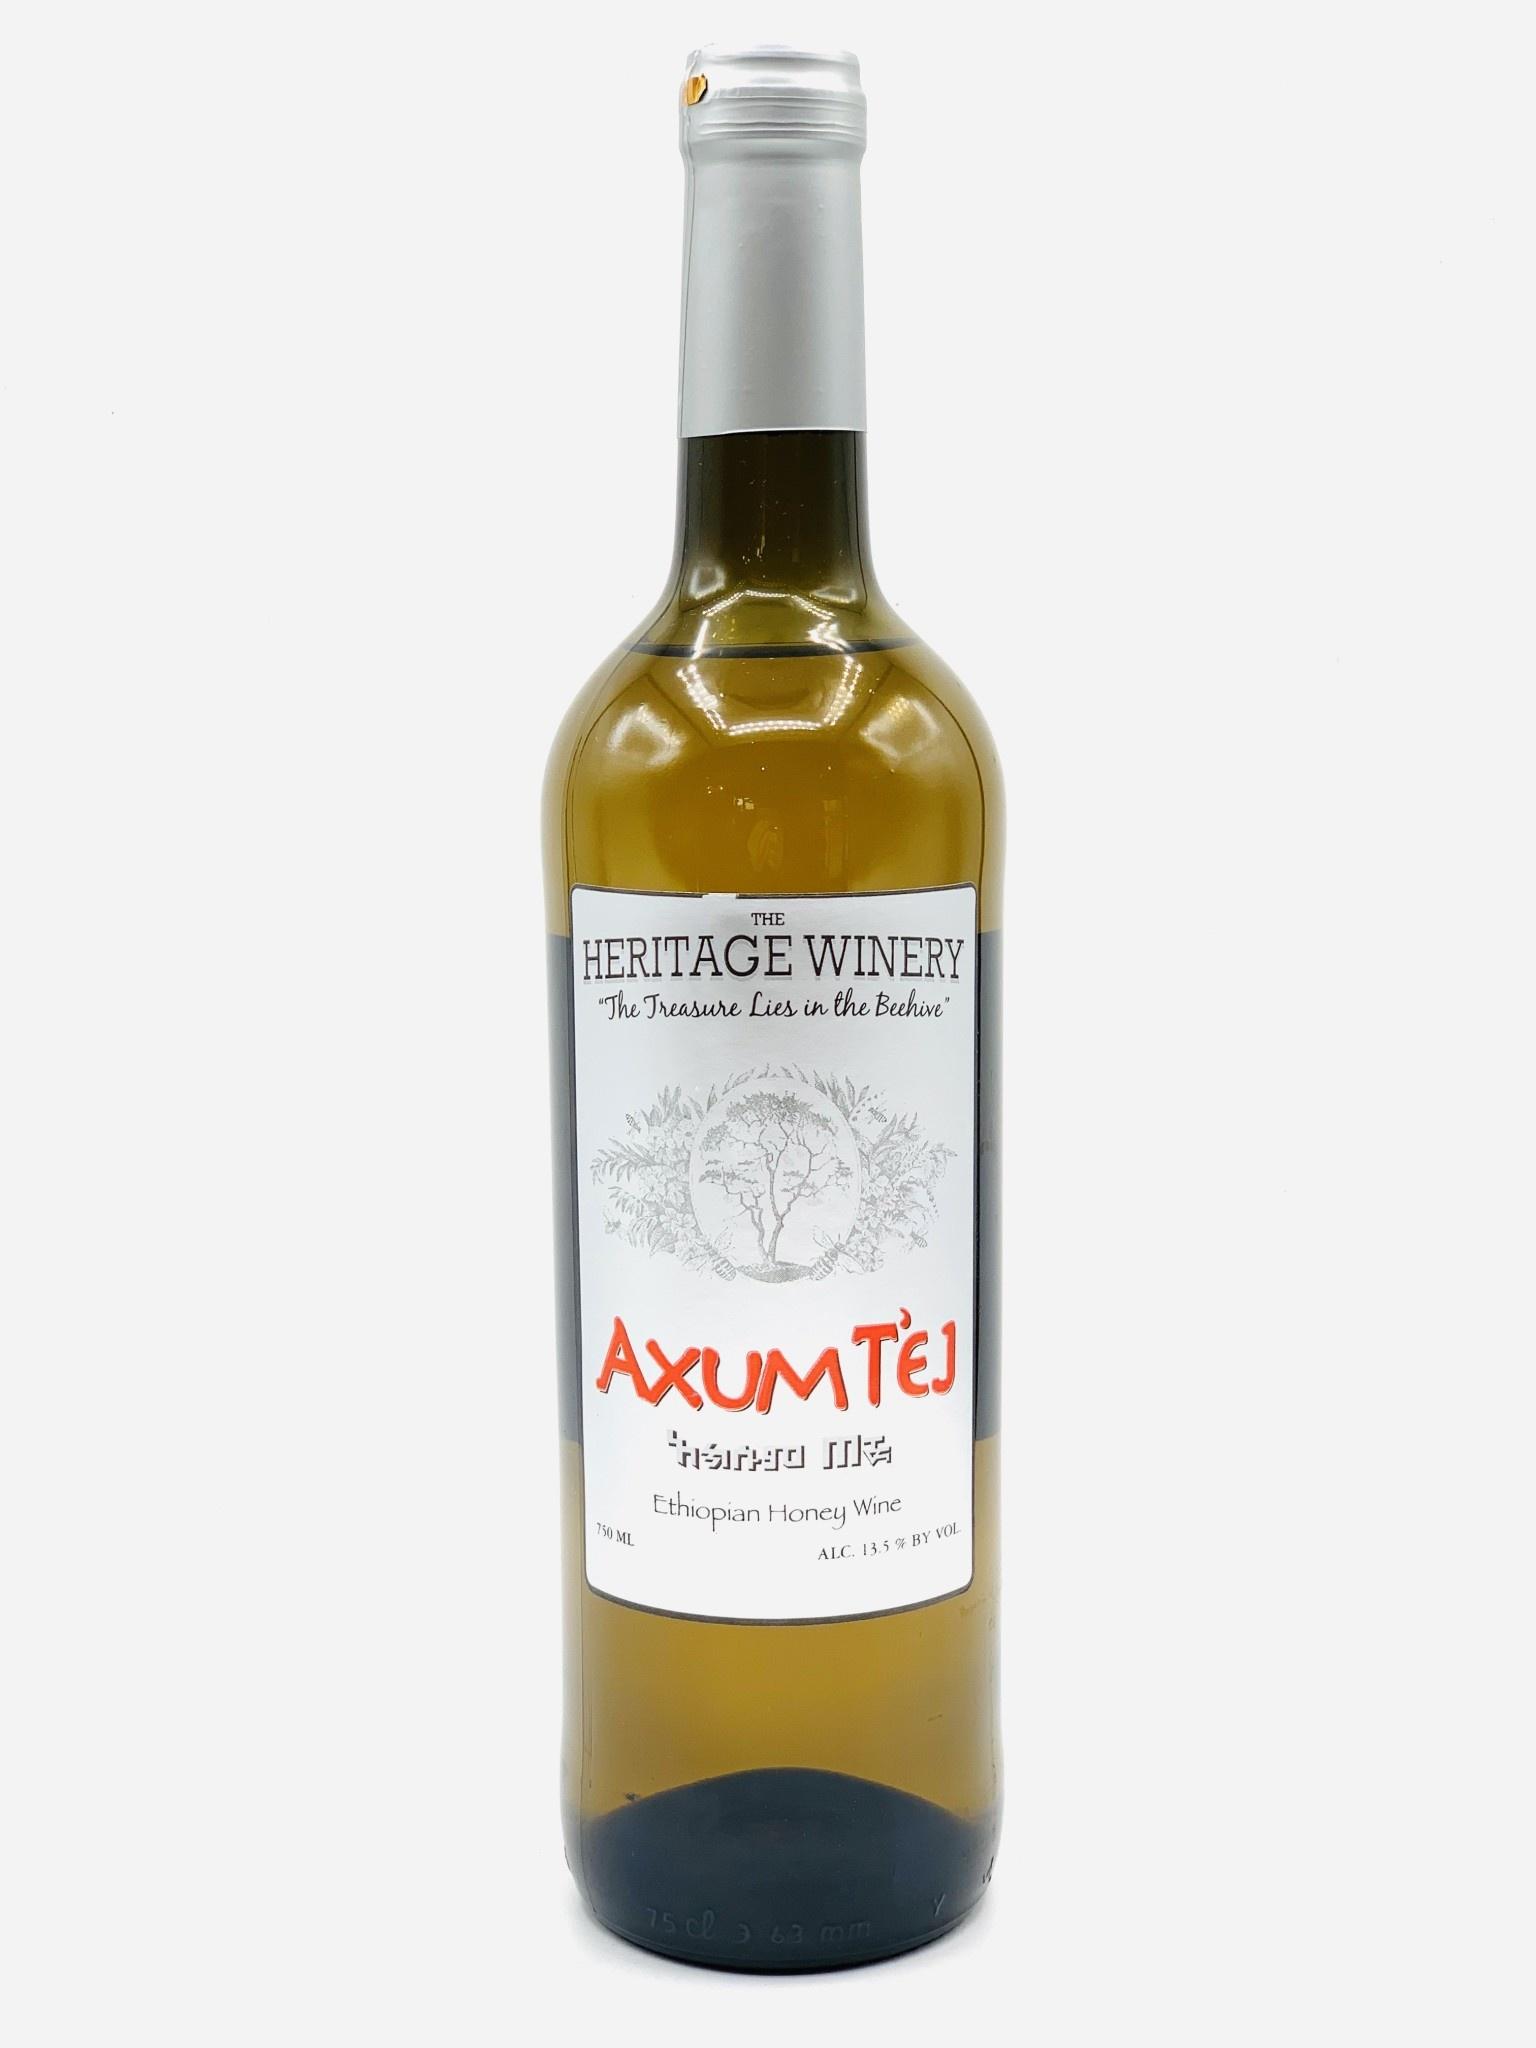 Ethiopian Honey Mead Wine NV Axum Tej